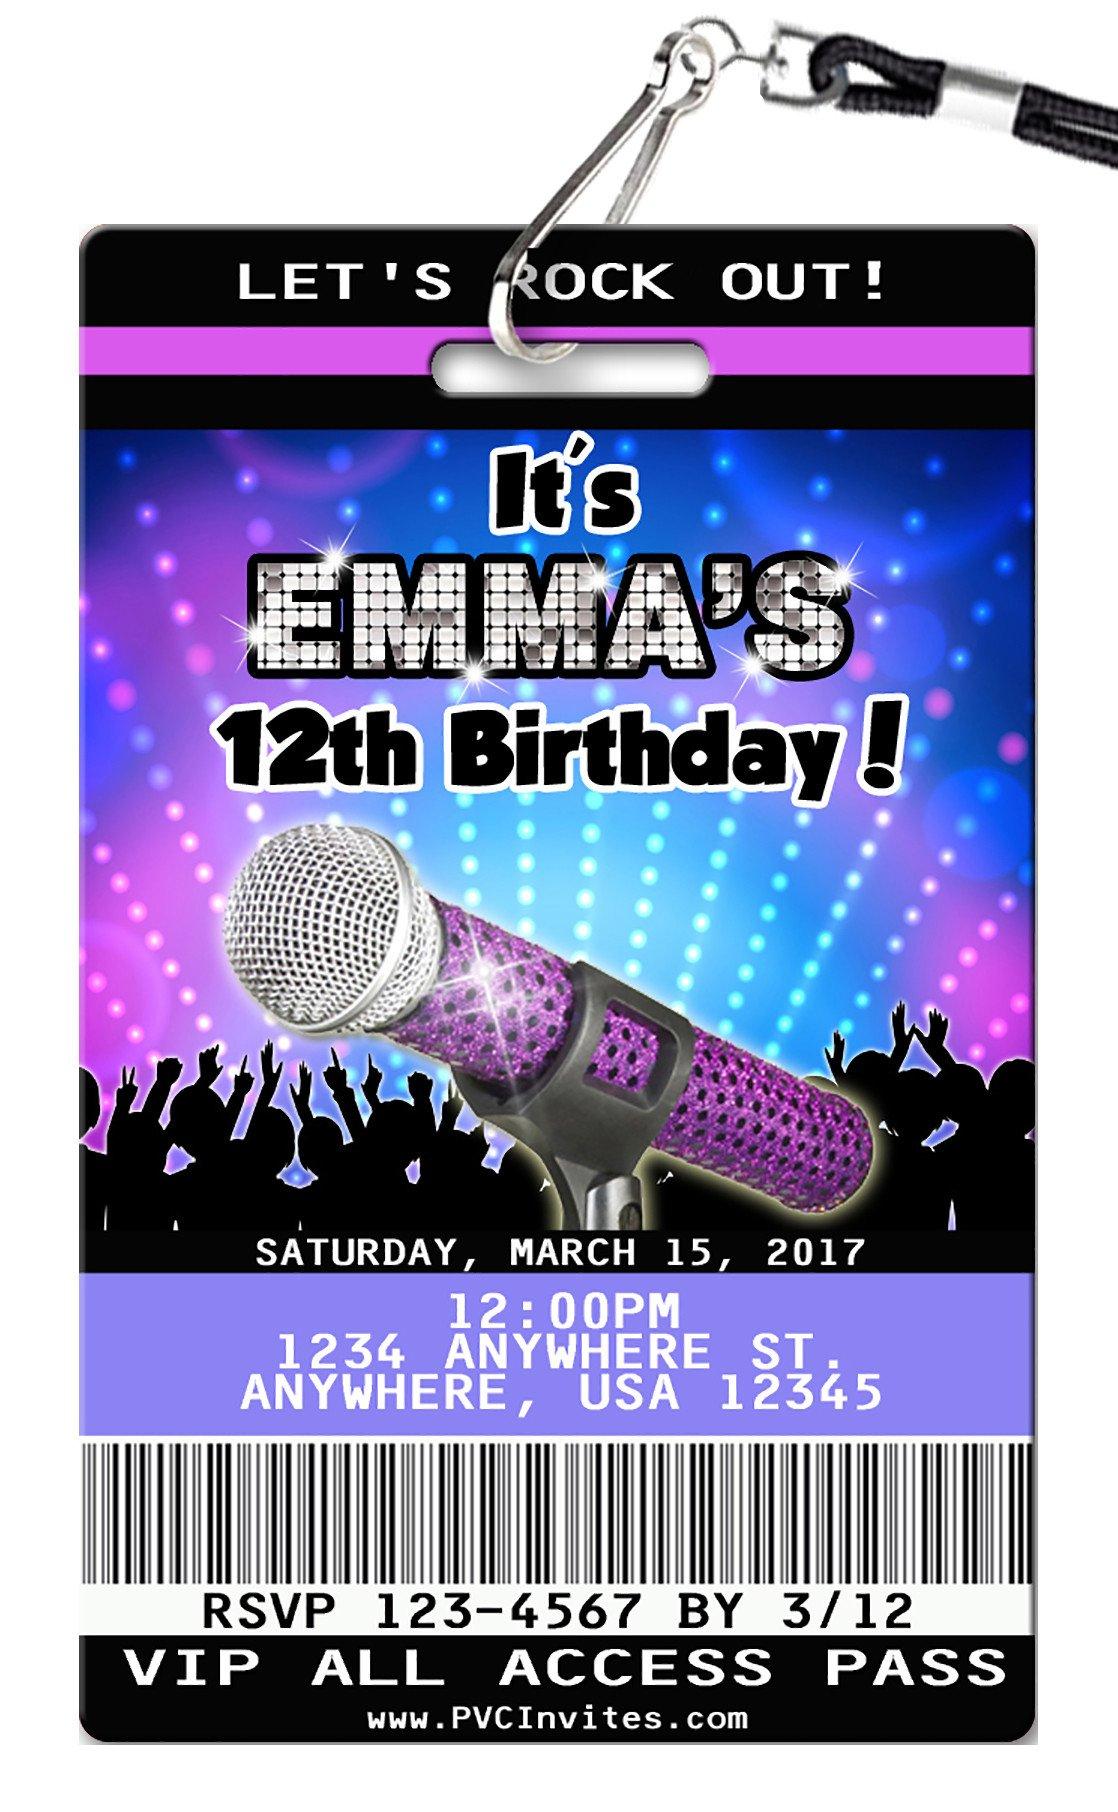 Karaoke Birthday Invitation In 2019 | Kenzi's 8Th Kareoke Birthday - Free Printable Karaoke Party Invitations